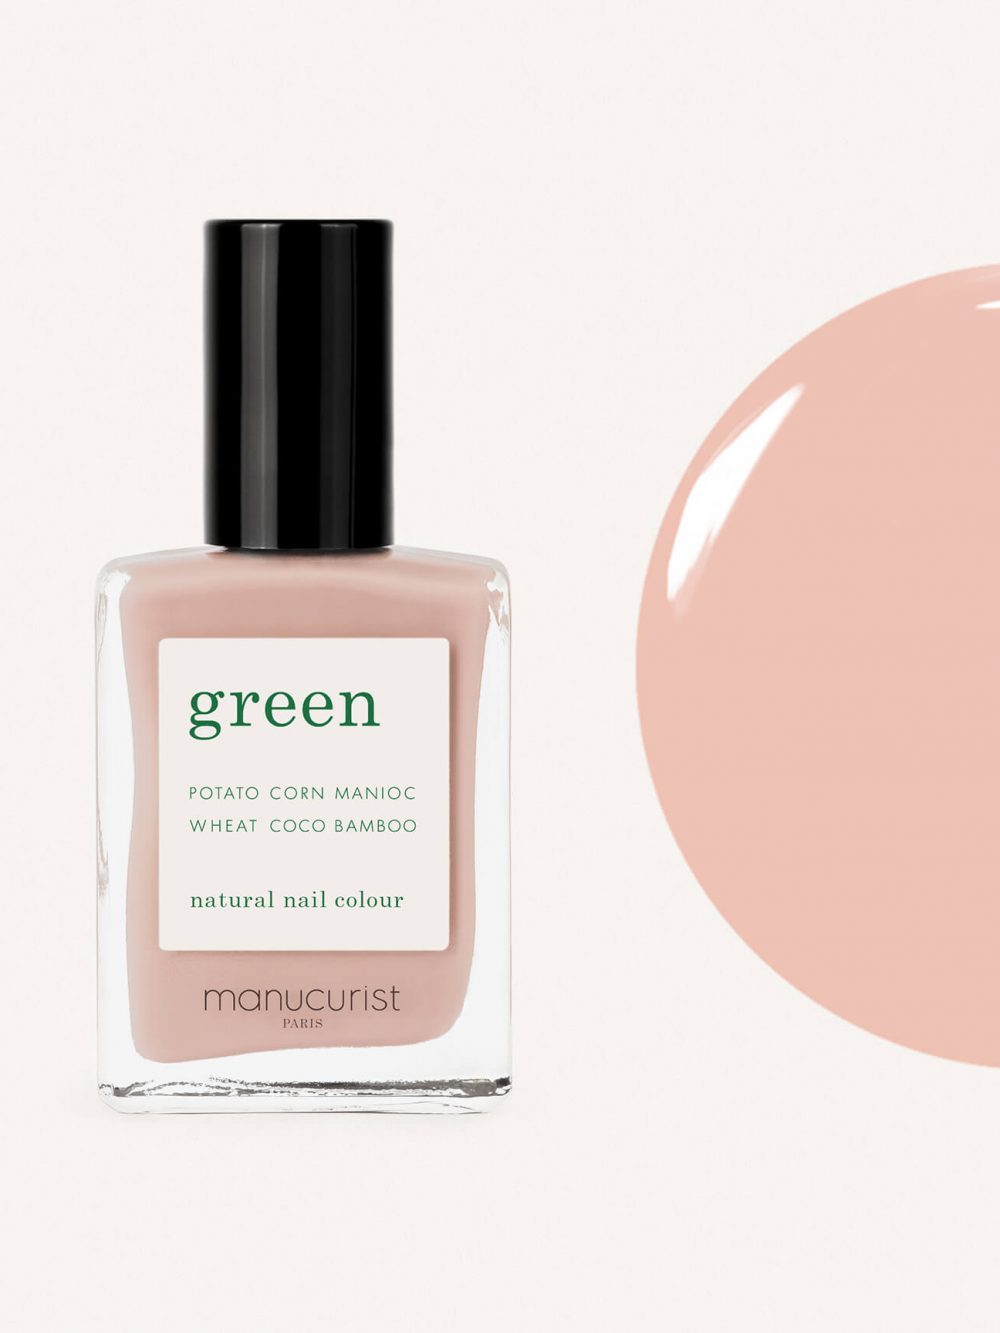 vernis à ongles bio green de la marque Manucurist made in france de couleur nude bare skin